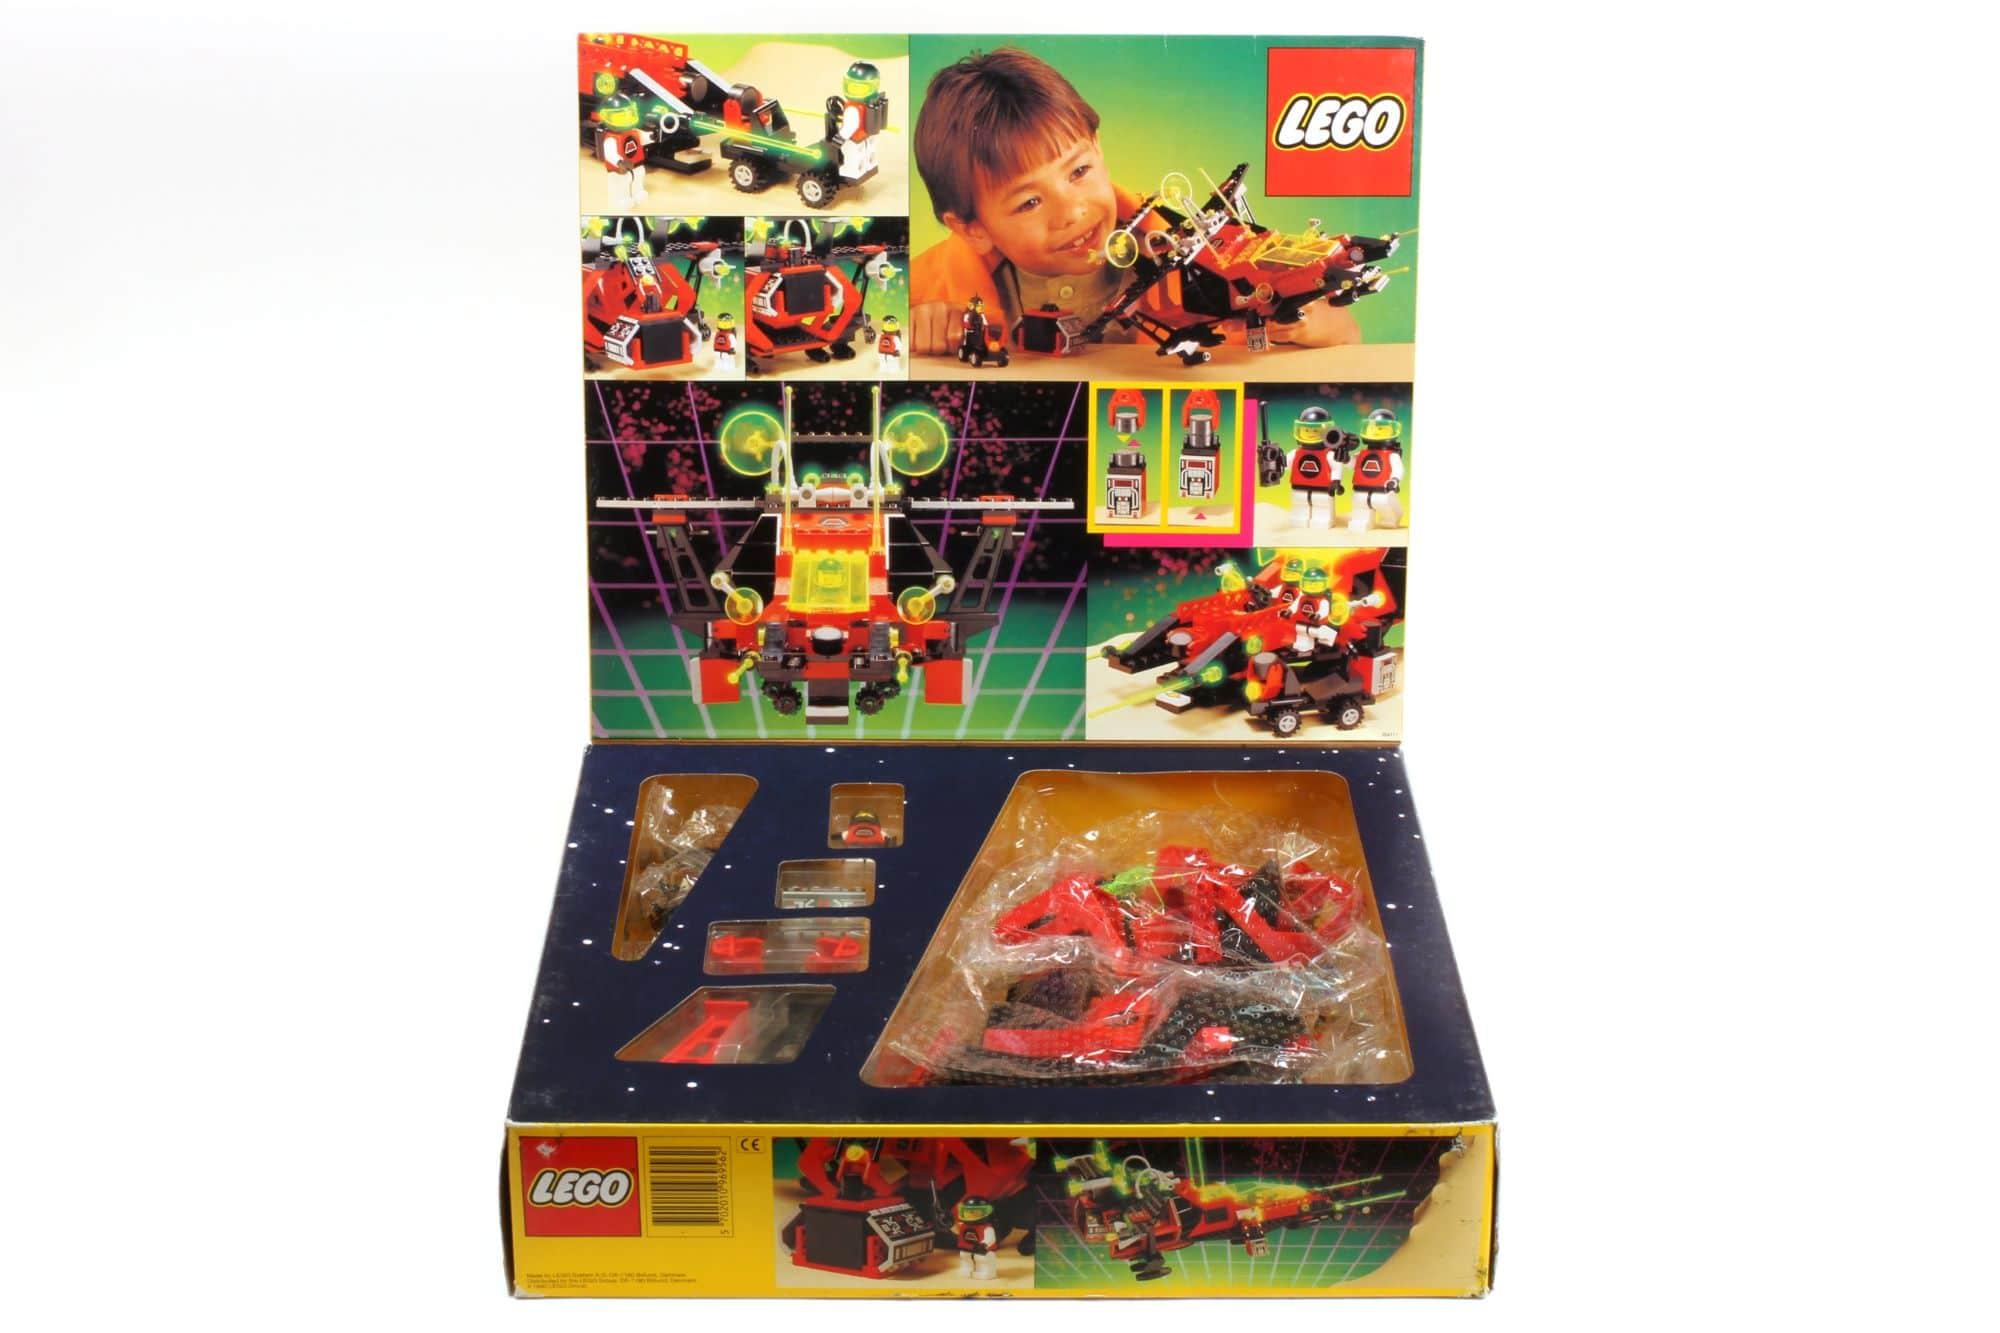 LEGO 6956 M Tron Stellar Recon Voyager Box 4